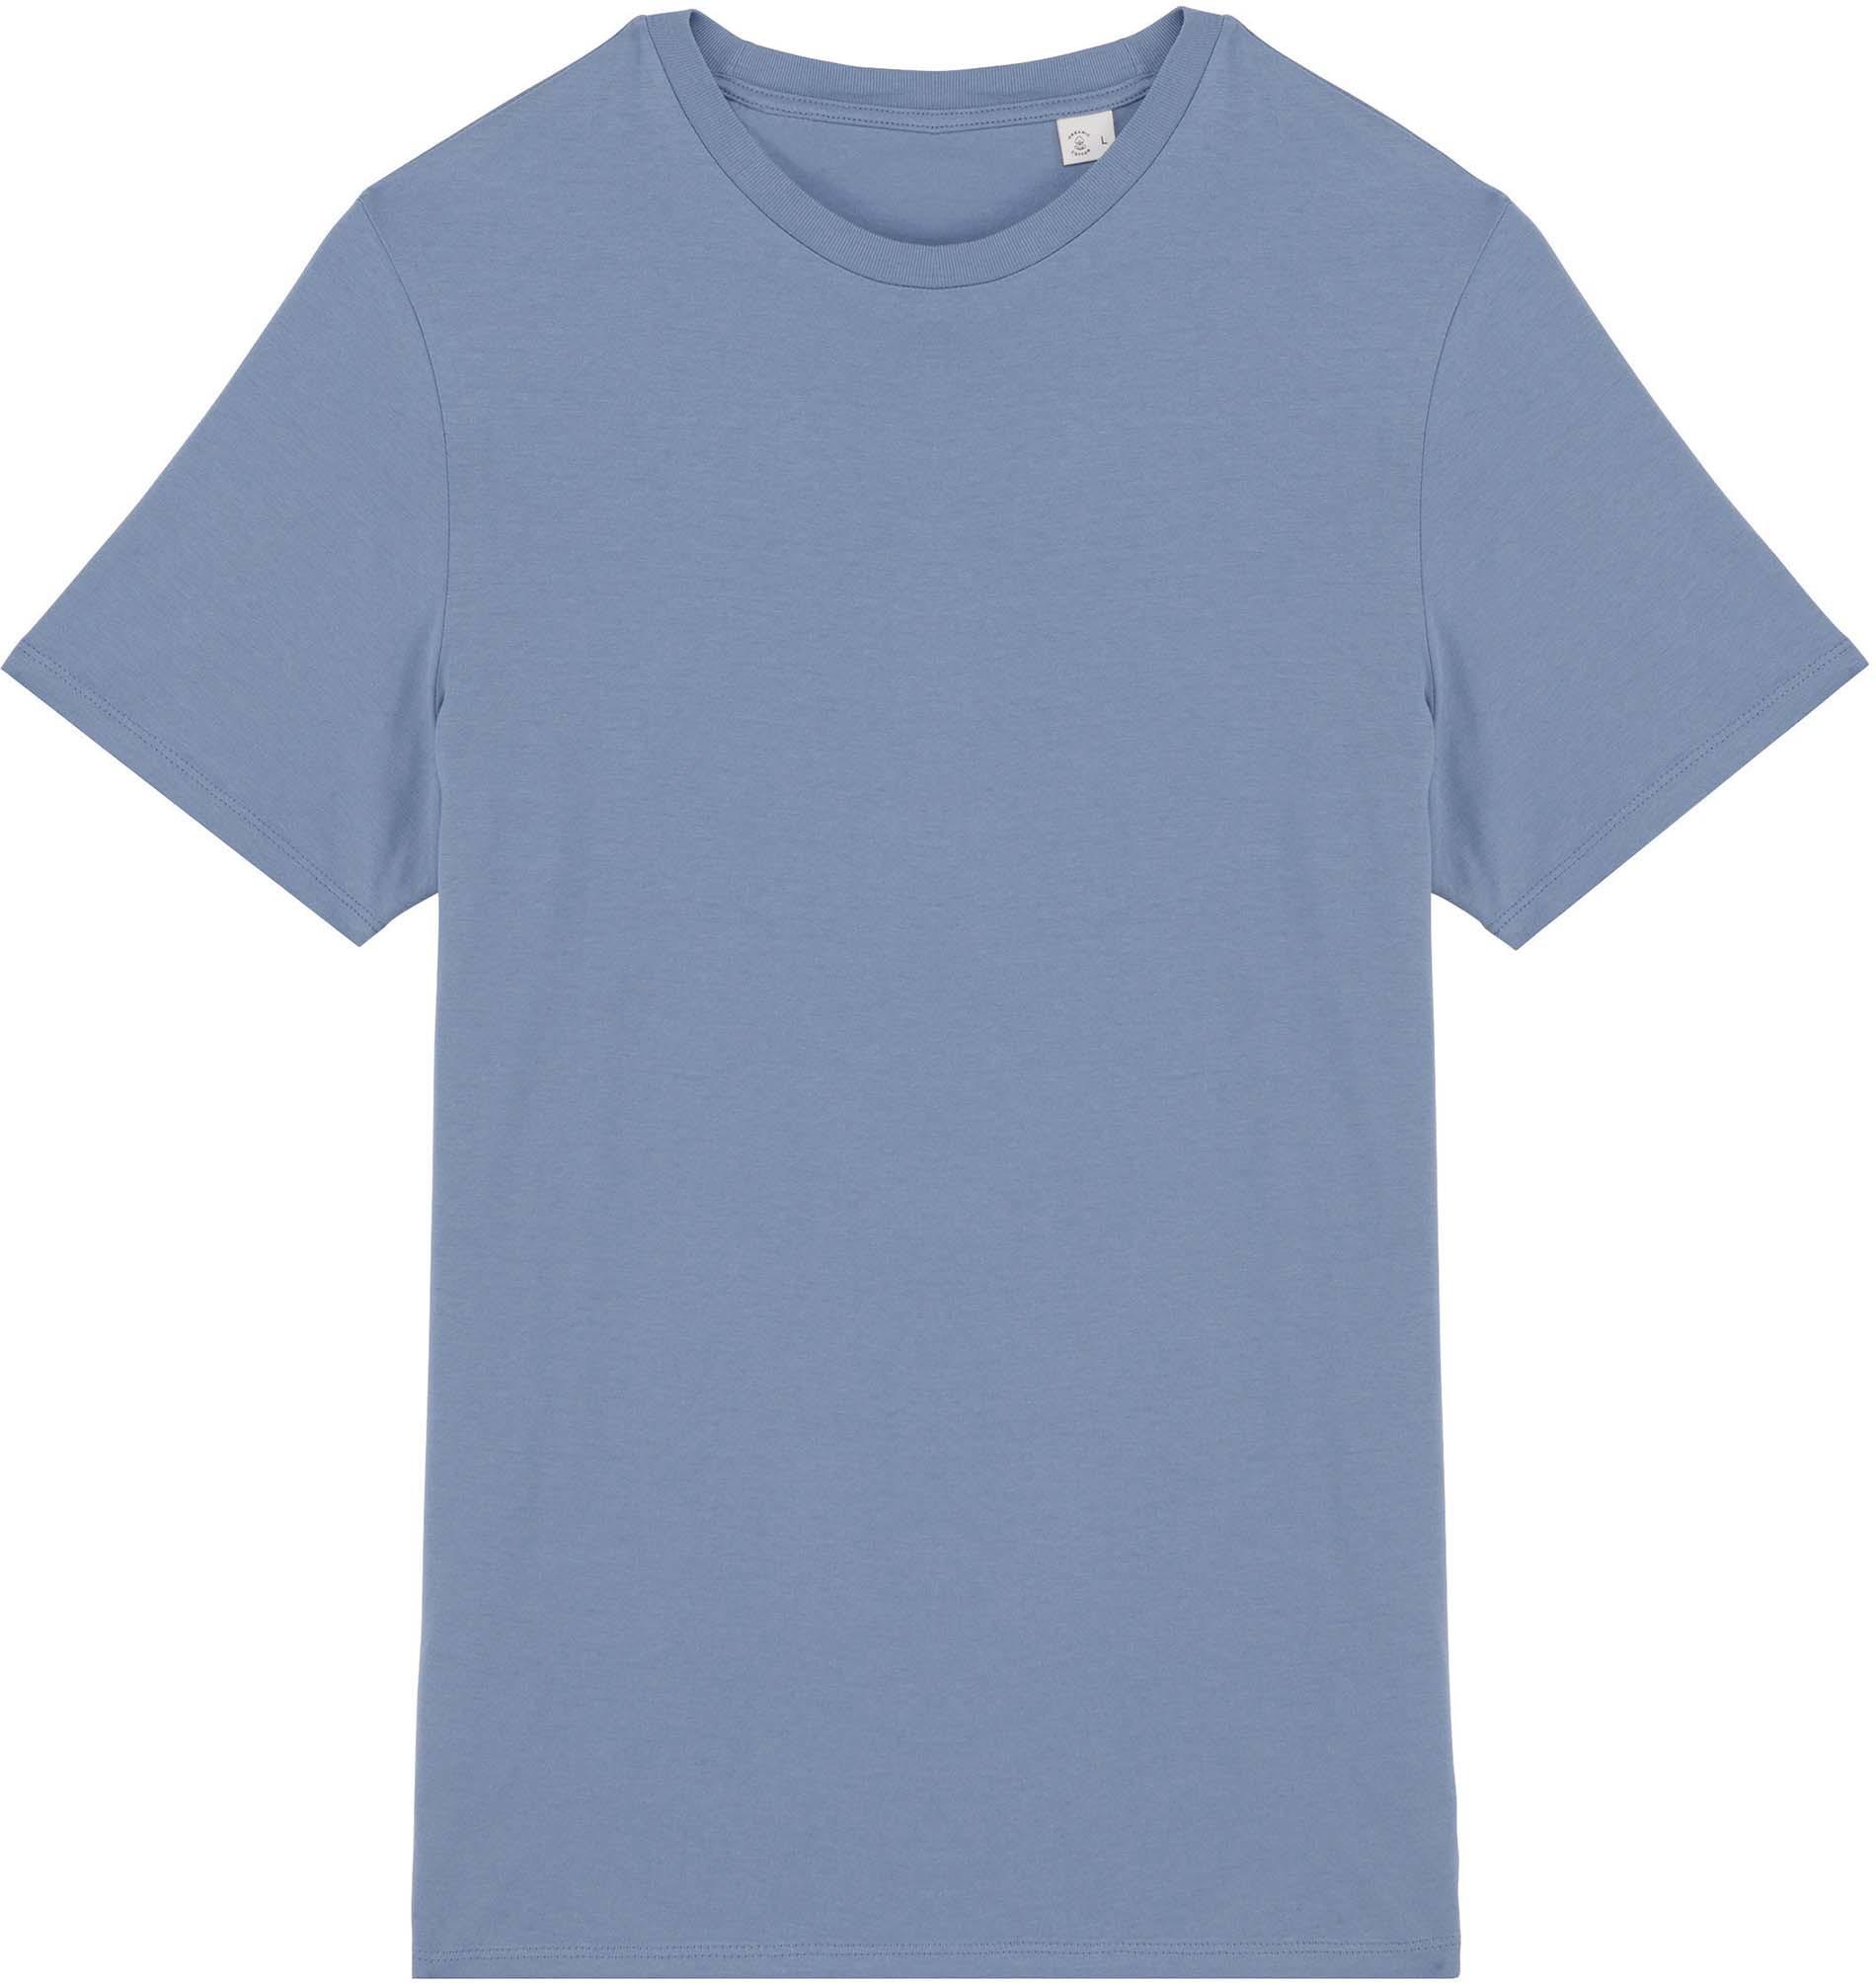 Tee-shirt manches courtes unisexe - 2-1843-7